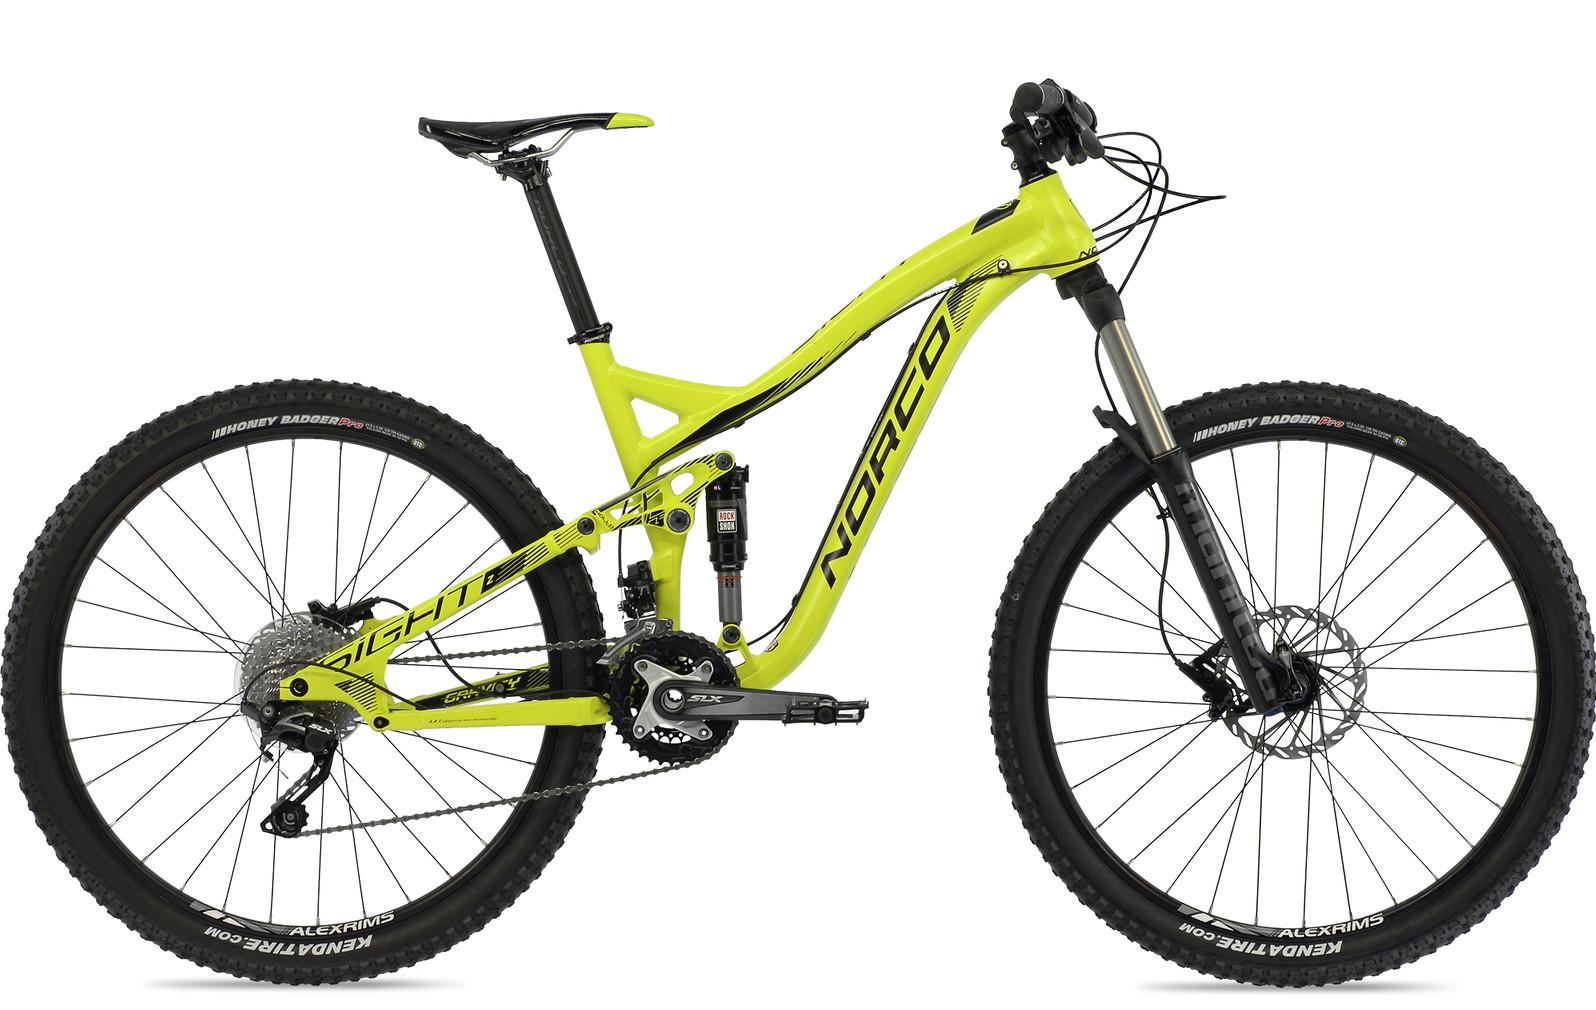 bike - 2014 Norco Sight Alloy 7.2 - green:black